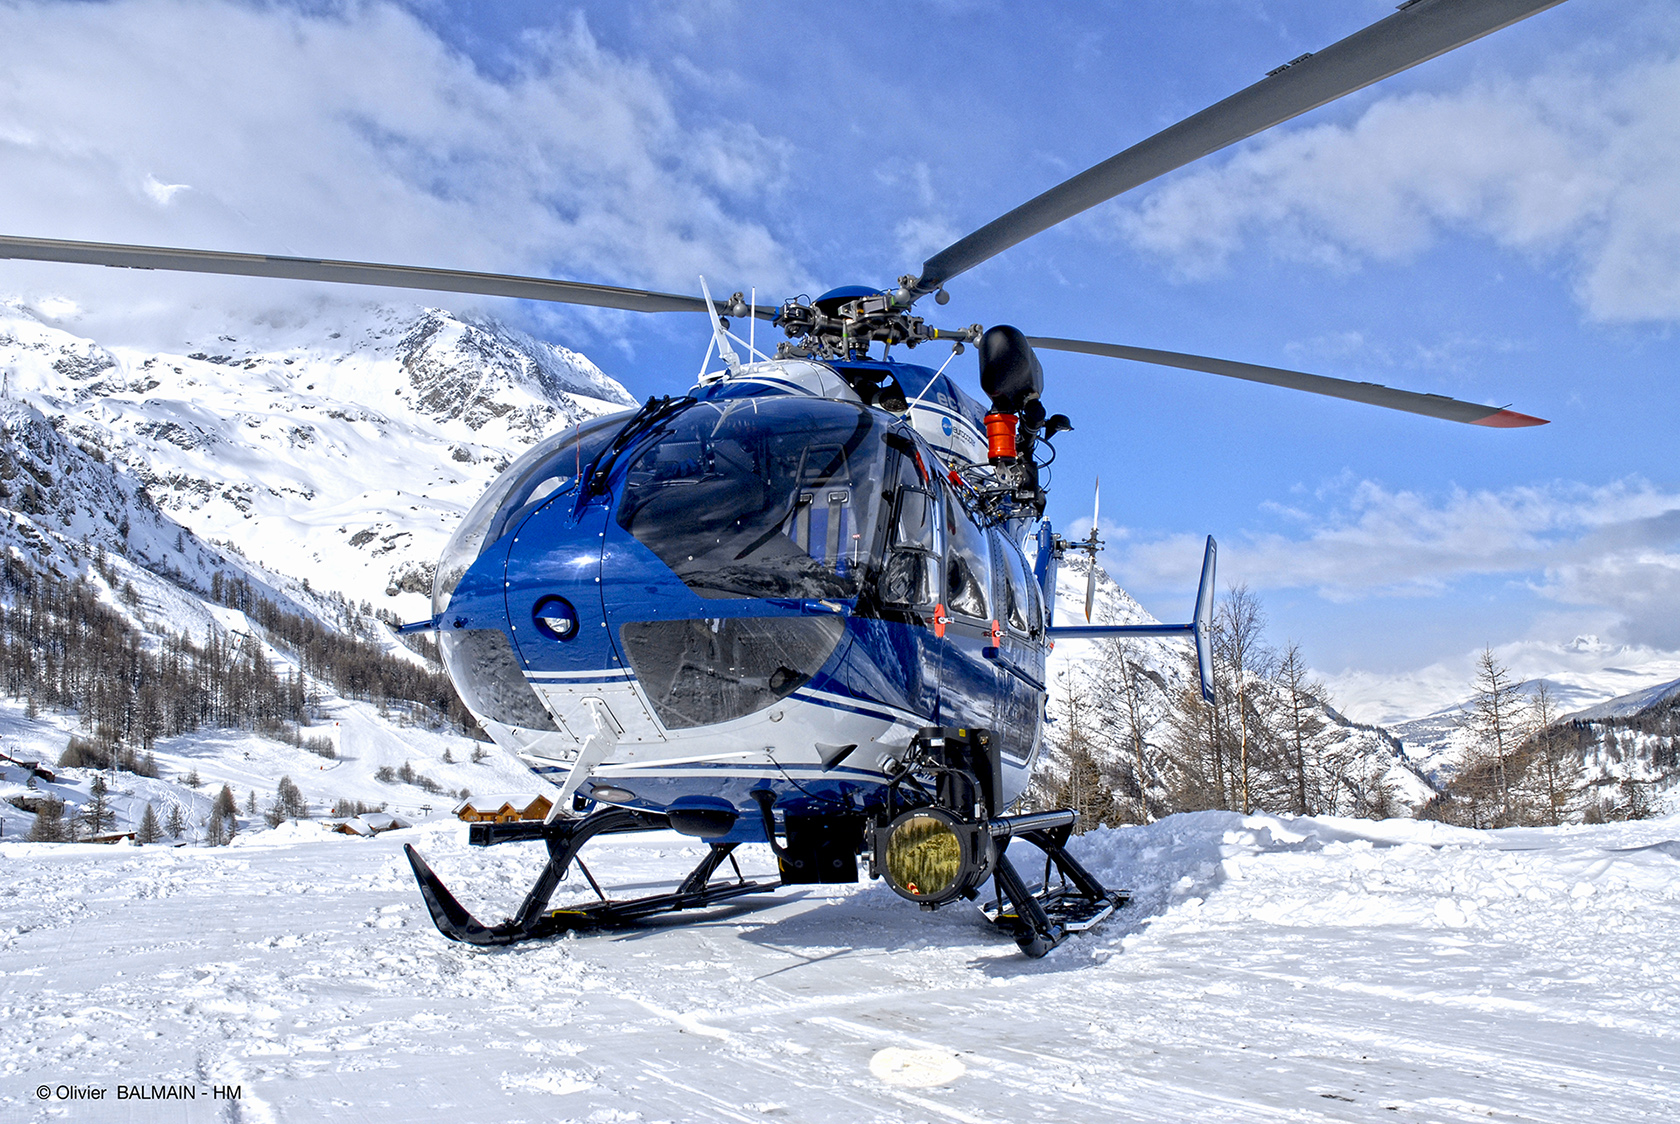 Choucas hélicoptère Gendaremerie  - © Olivier BALMAIN